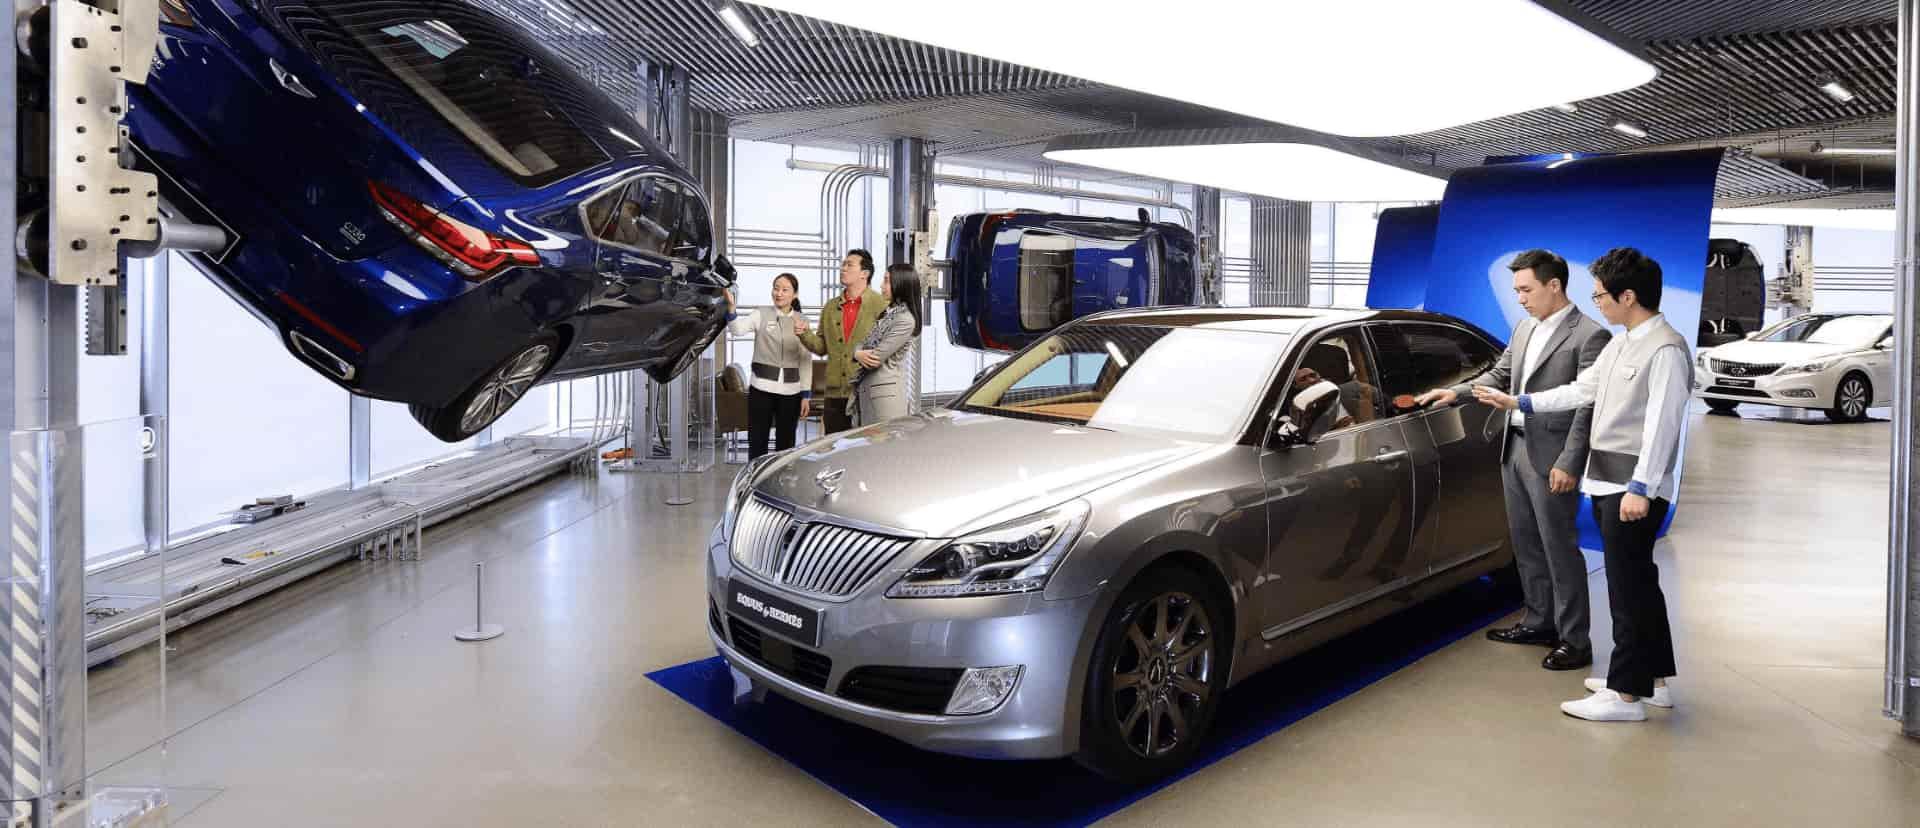 Retail experience design for Hyundai Motor